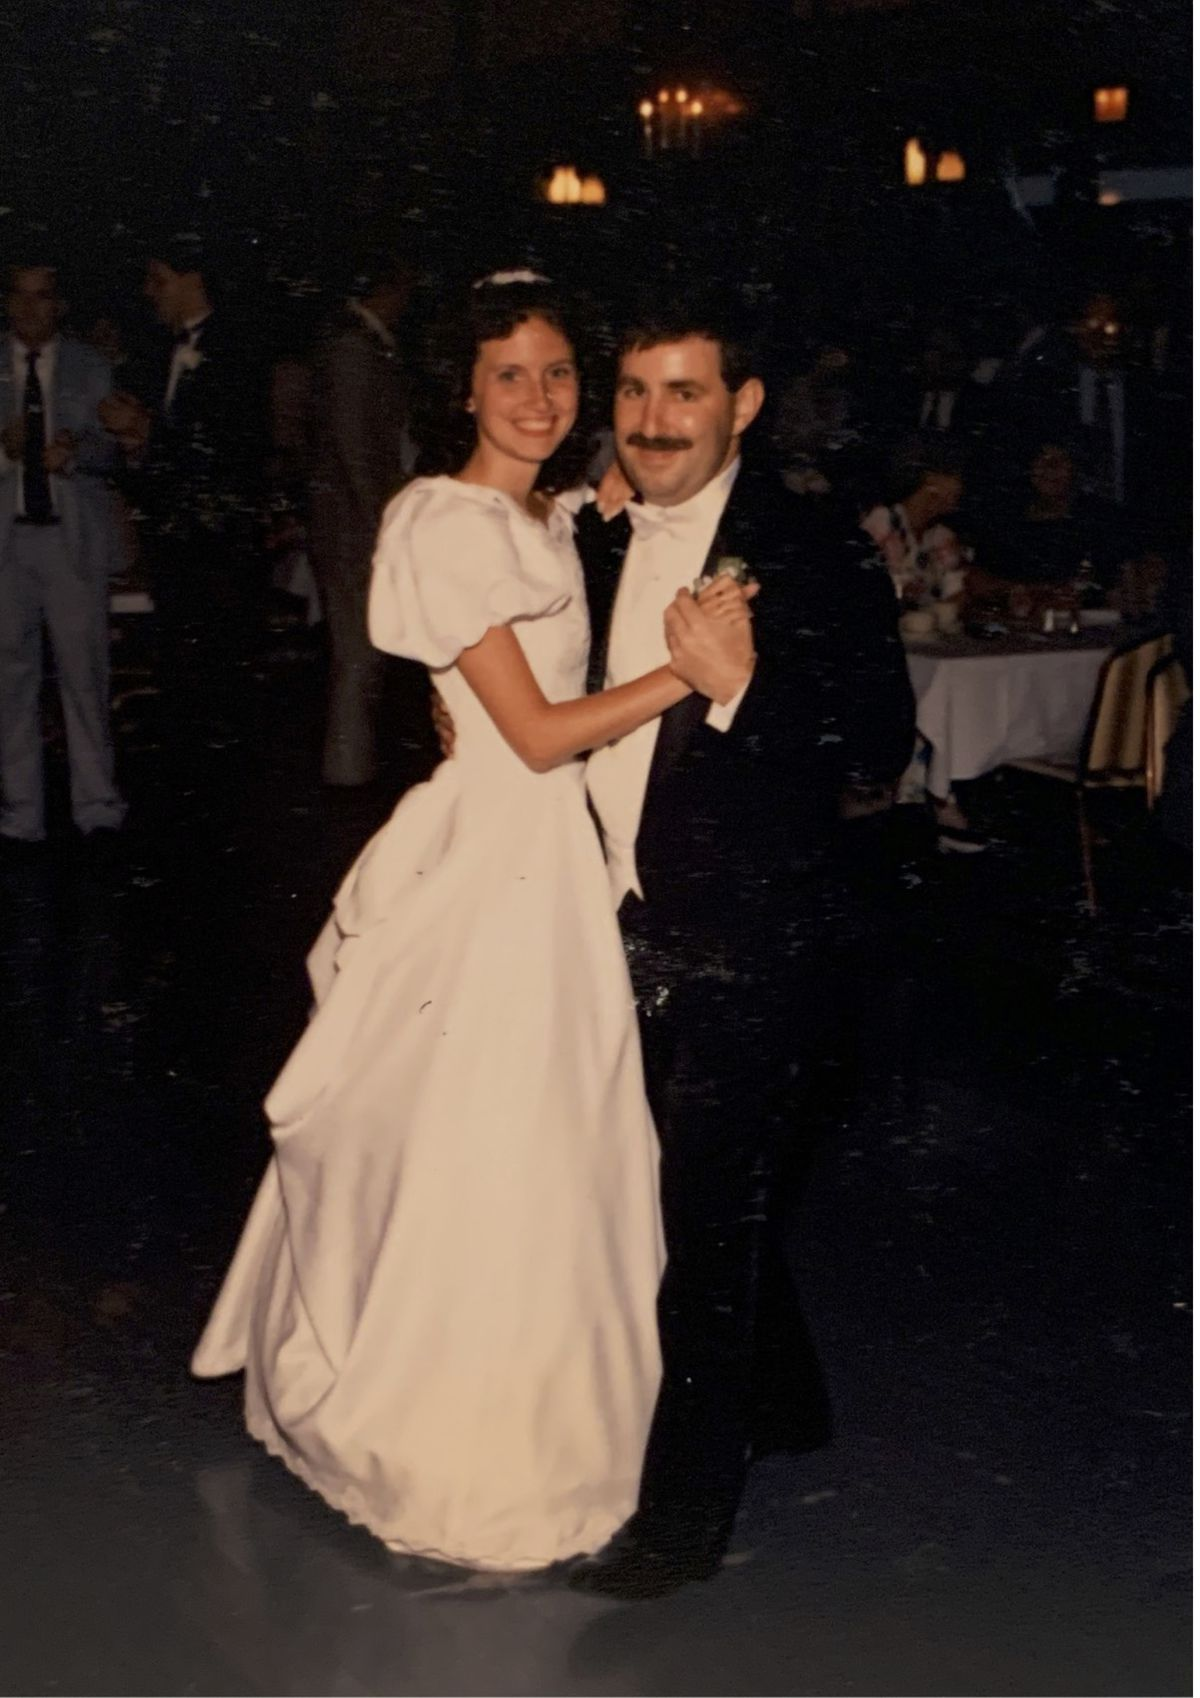 Meg and John Rooney at their 1989 wedding.